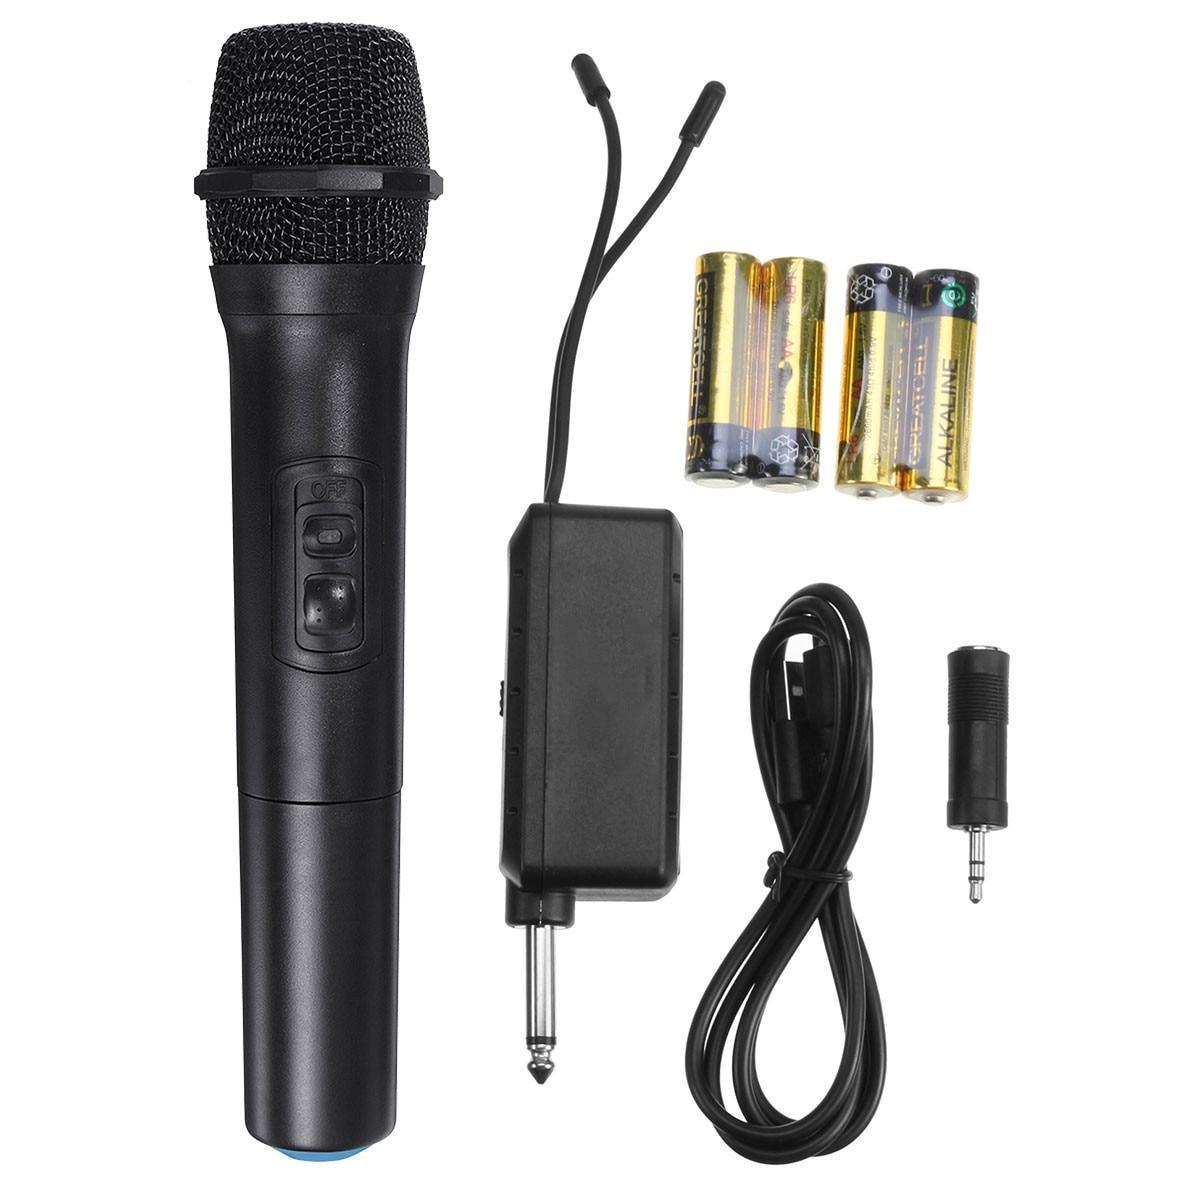 Micrófono UHF profesional, inalámbrico por bluetooth, micrófono dinámico, Karaoke, amplificador de altavoz de DJ, micrófono de mano, reproductor KTV